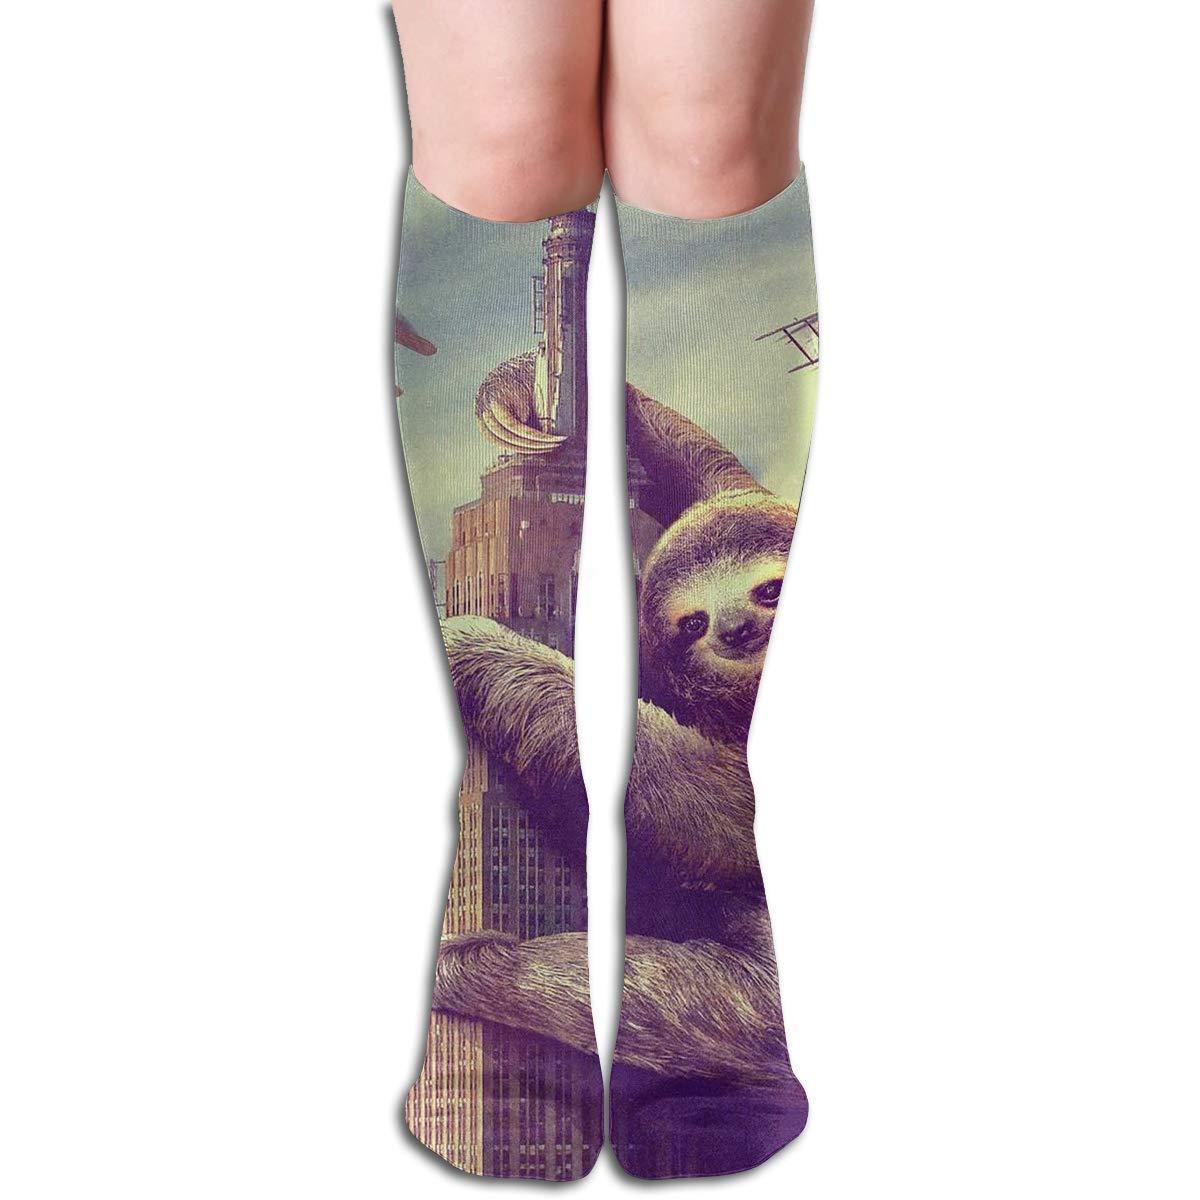 HOJJP Socks Tube Knee High Socks 50CM Sloth Climb The Building Men's Over-The-Calf Tube Sports Socks Extra Long Compression Stocking